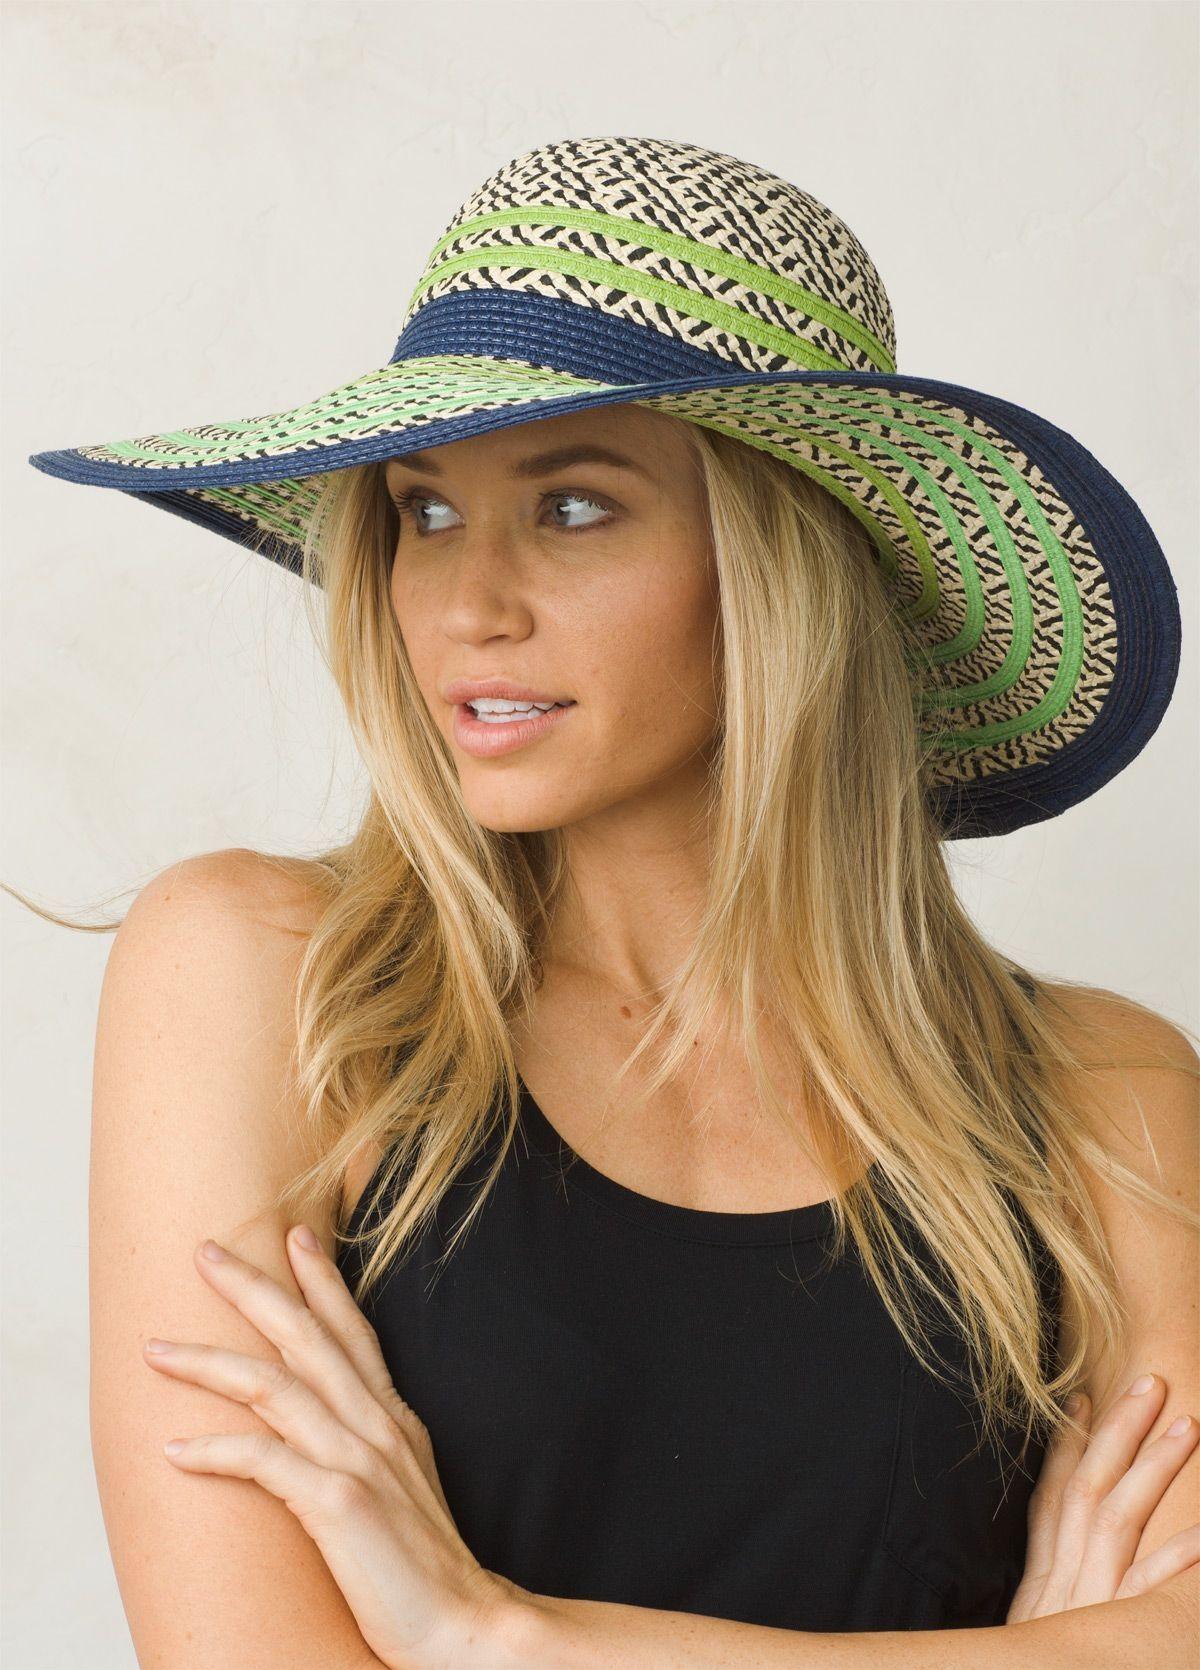 Dora Sun Hat | Women's Hats & Headbands | prAna